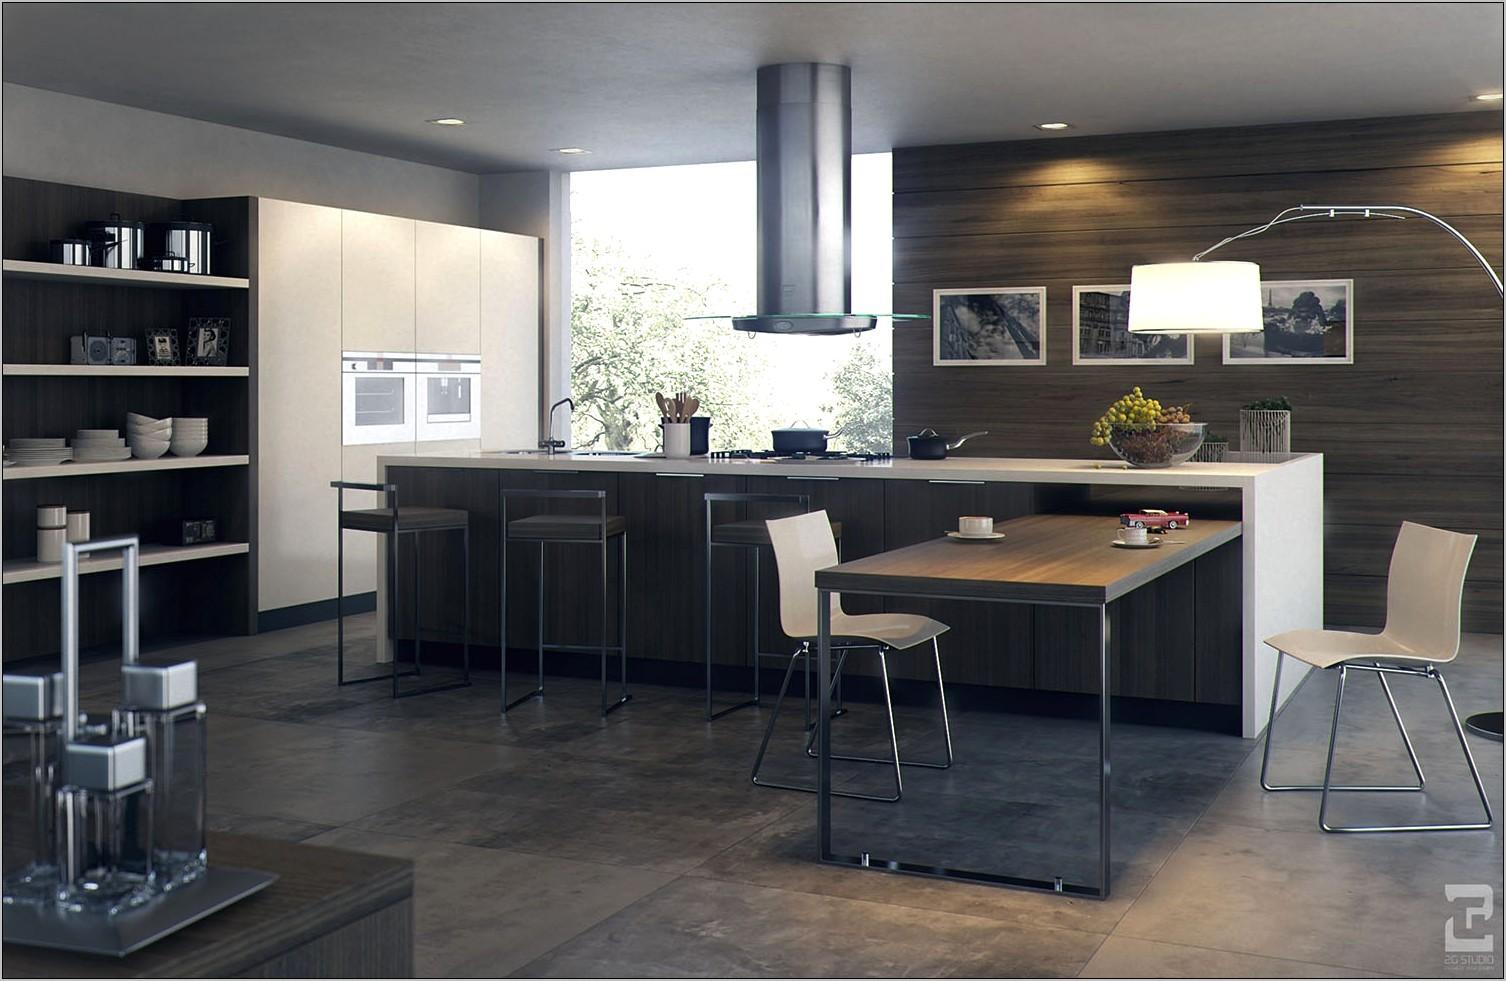 Theme Kitchen Decor Manly